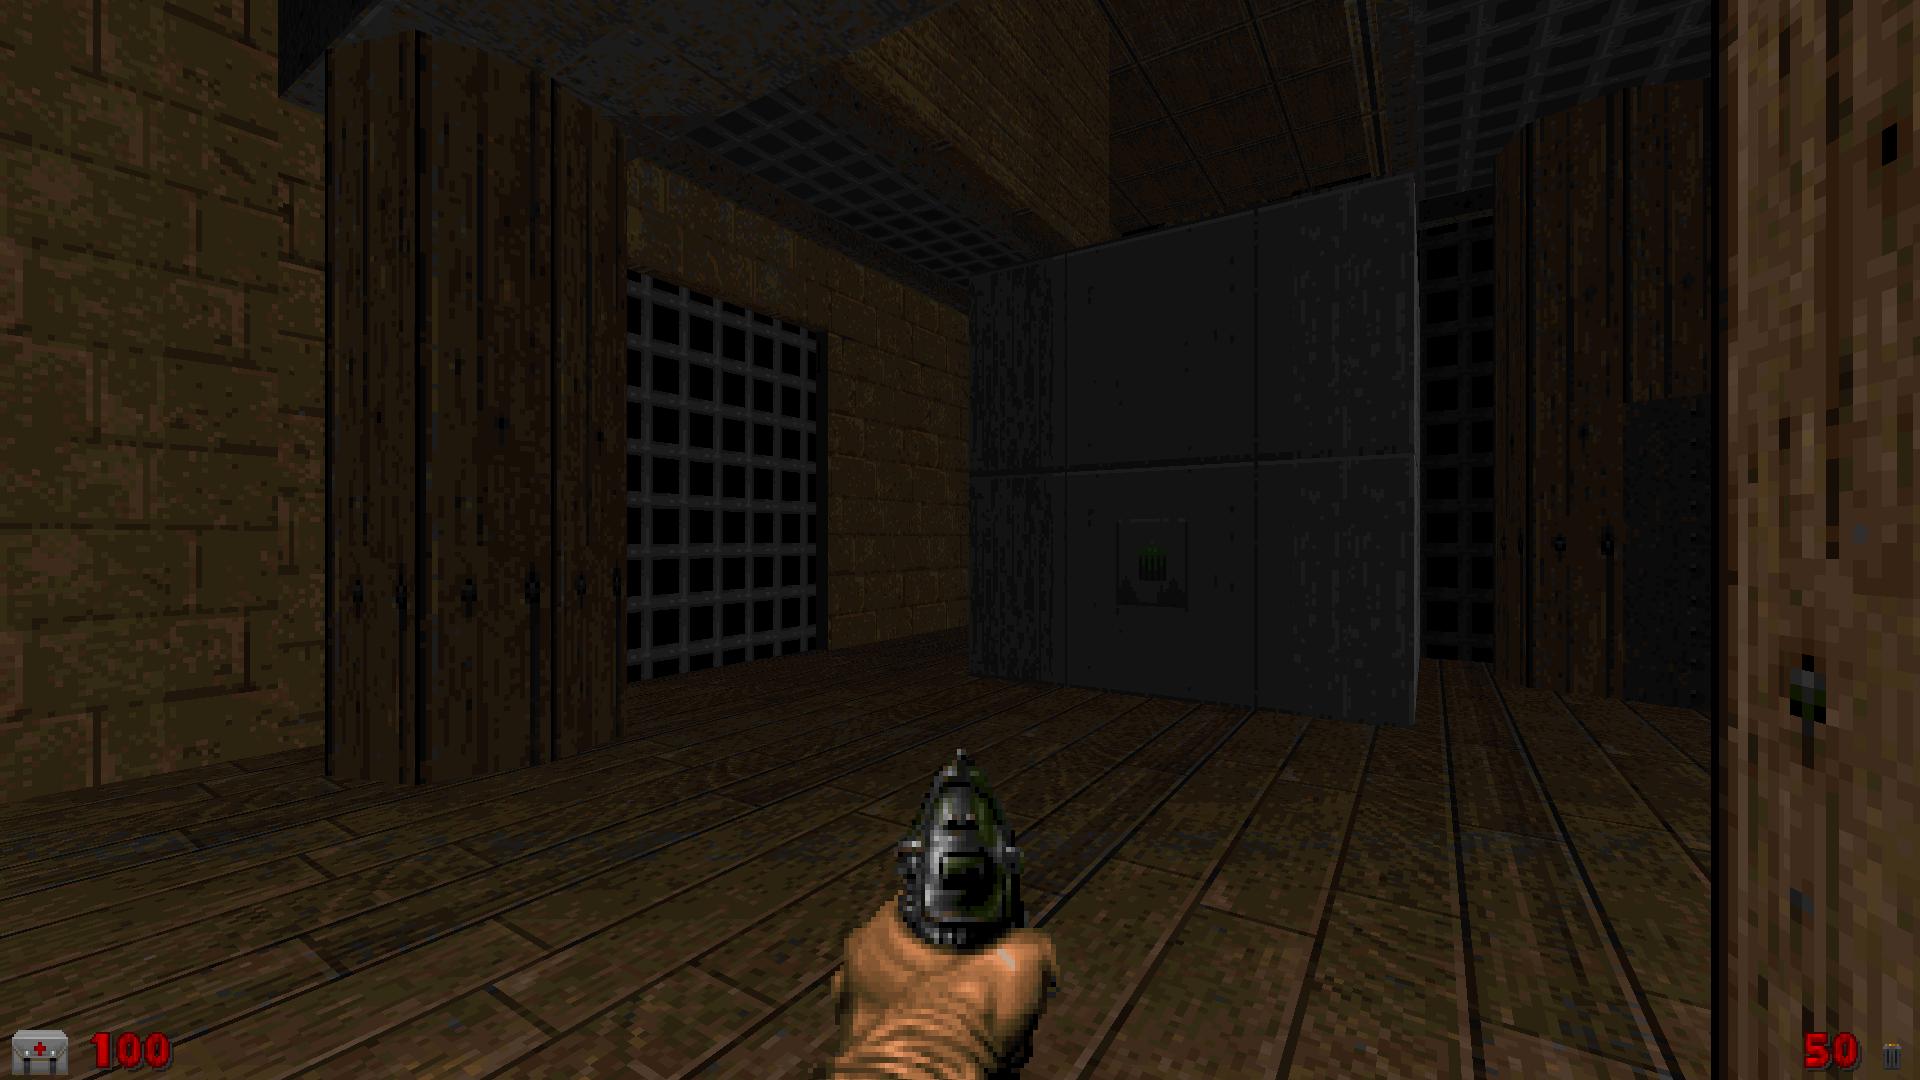 Screenshot_Doom_20200330_190004.png.81a199787f9081bf593943995bb25fd0.png